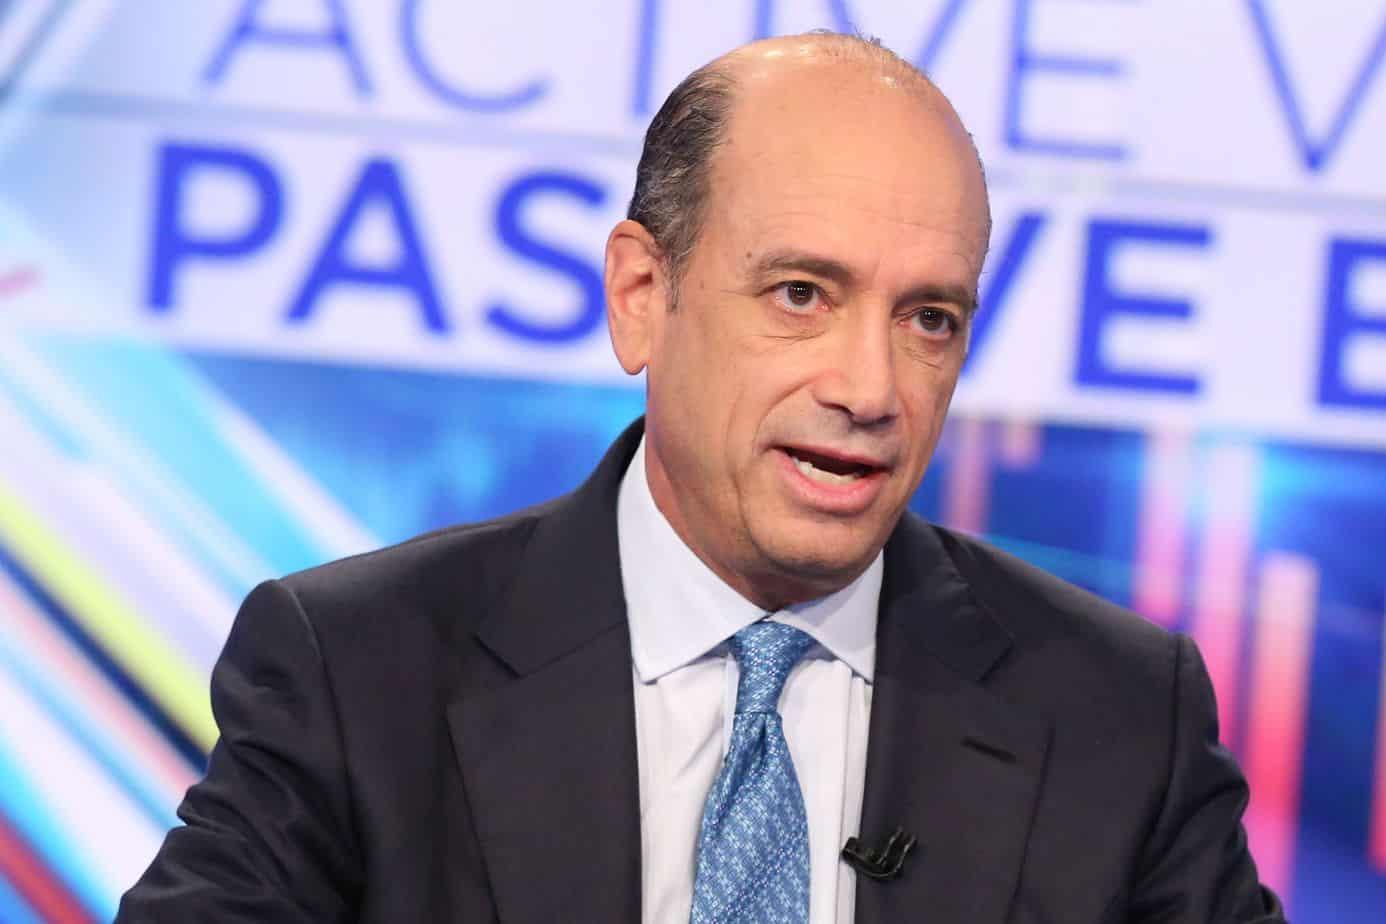 Joel Greenblatt: chi è il co-fondatore di Value Investors Club?